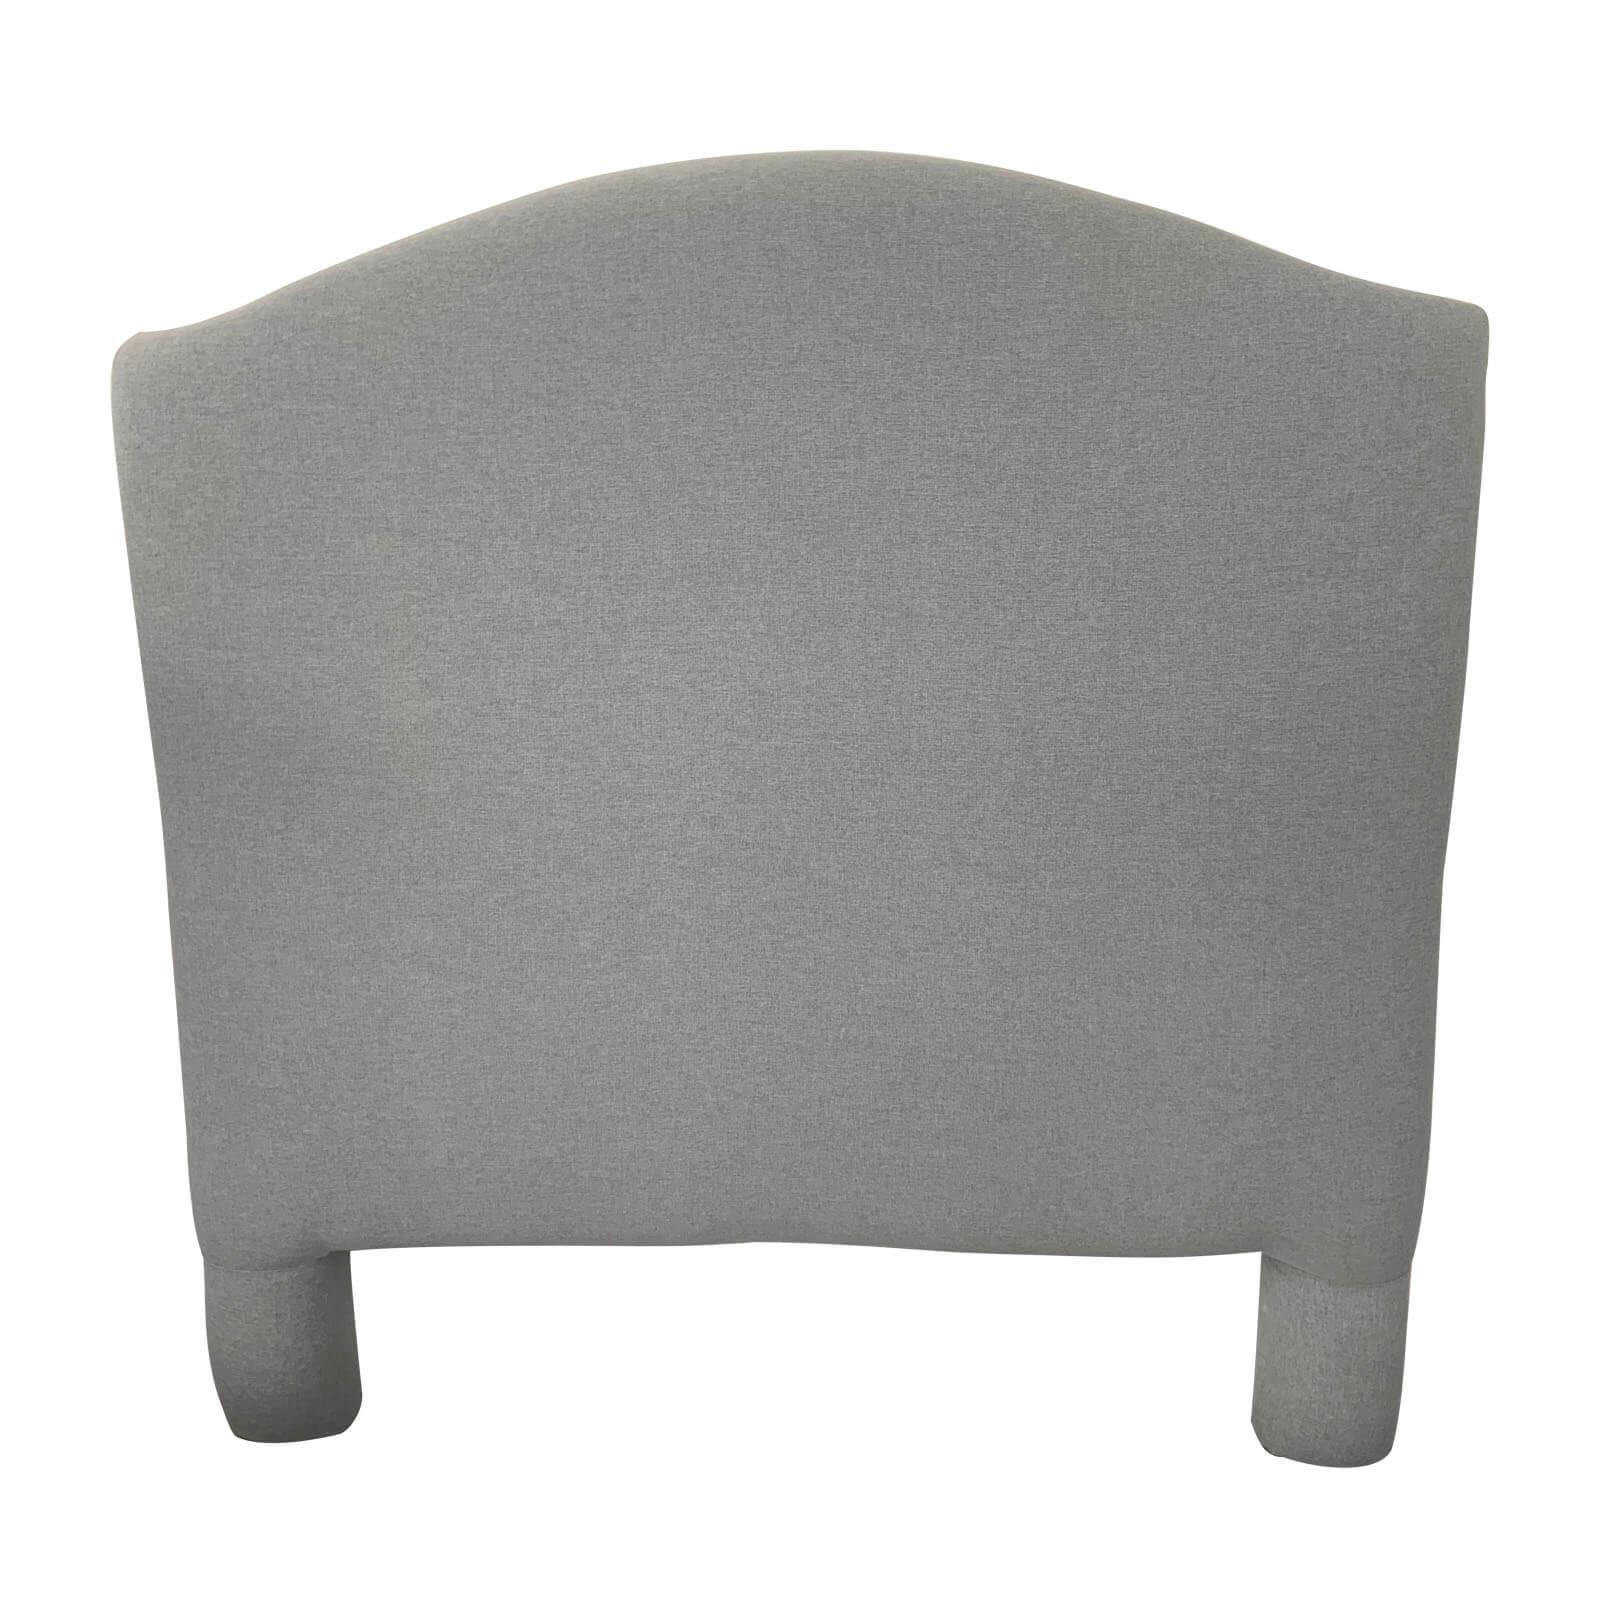 Two Design Lovers Bedsahead grey Estelle bedhead